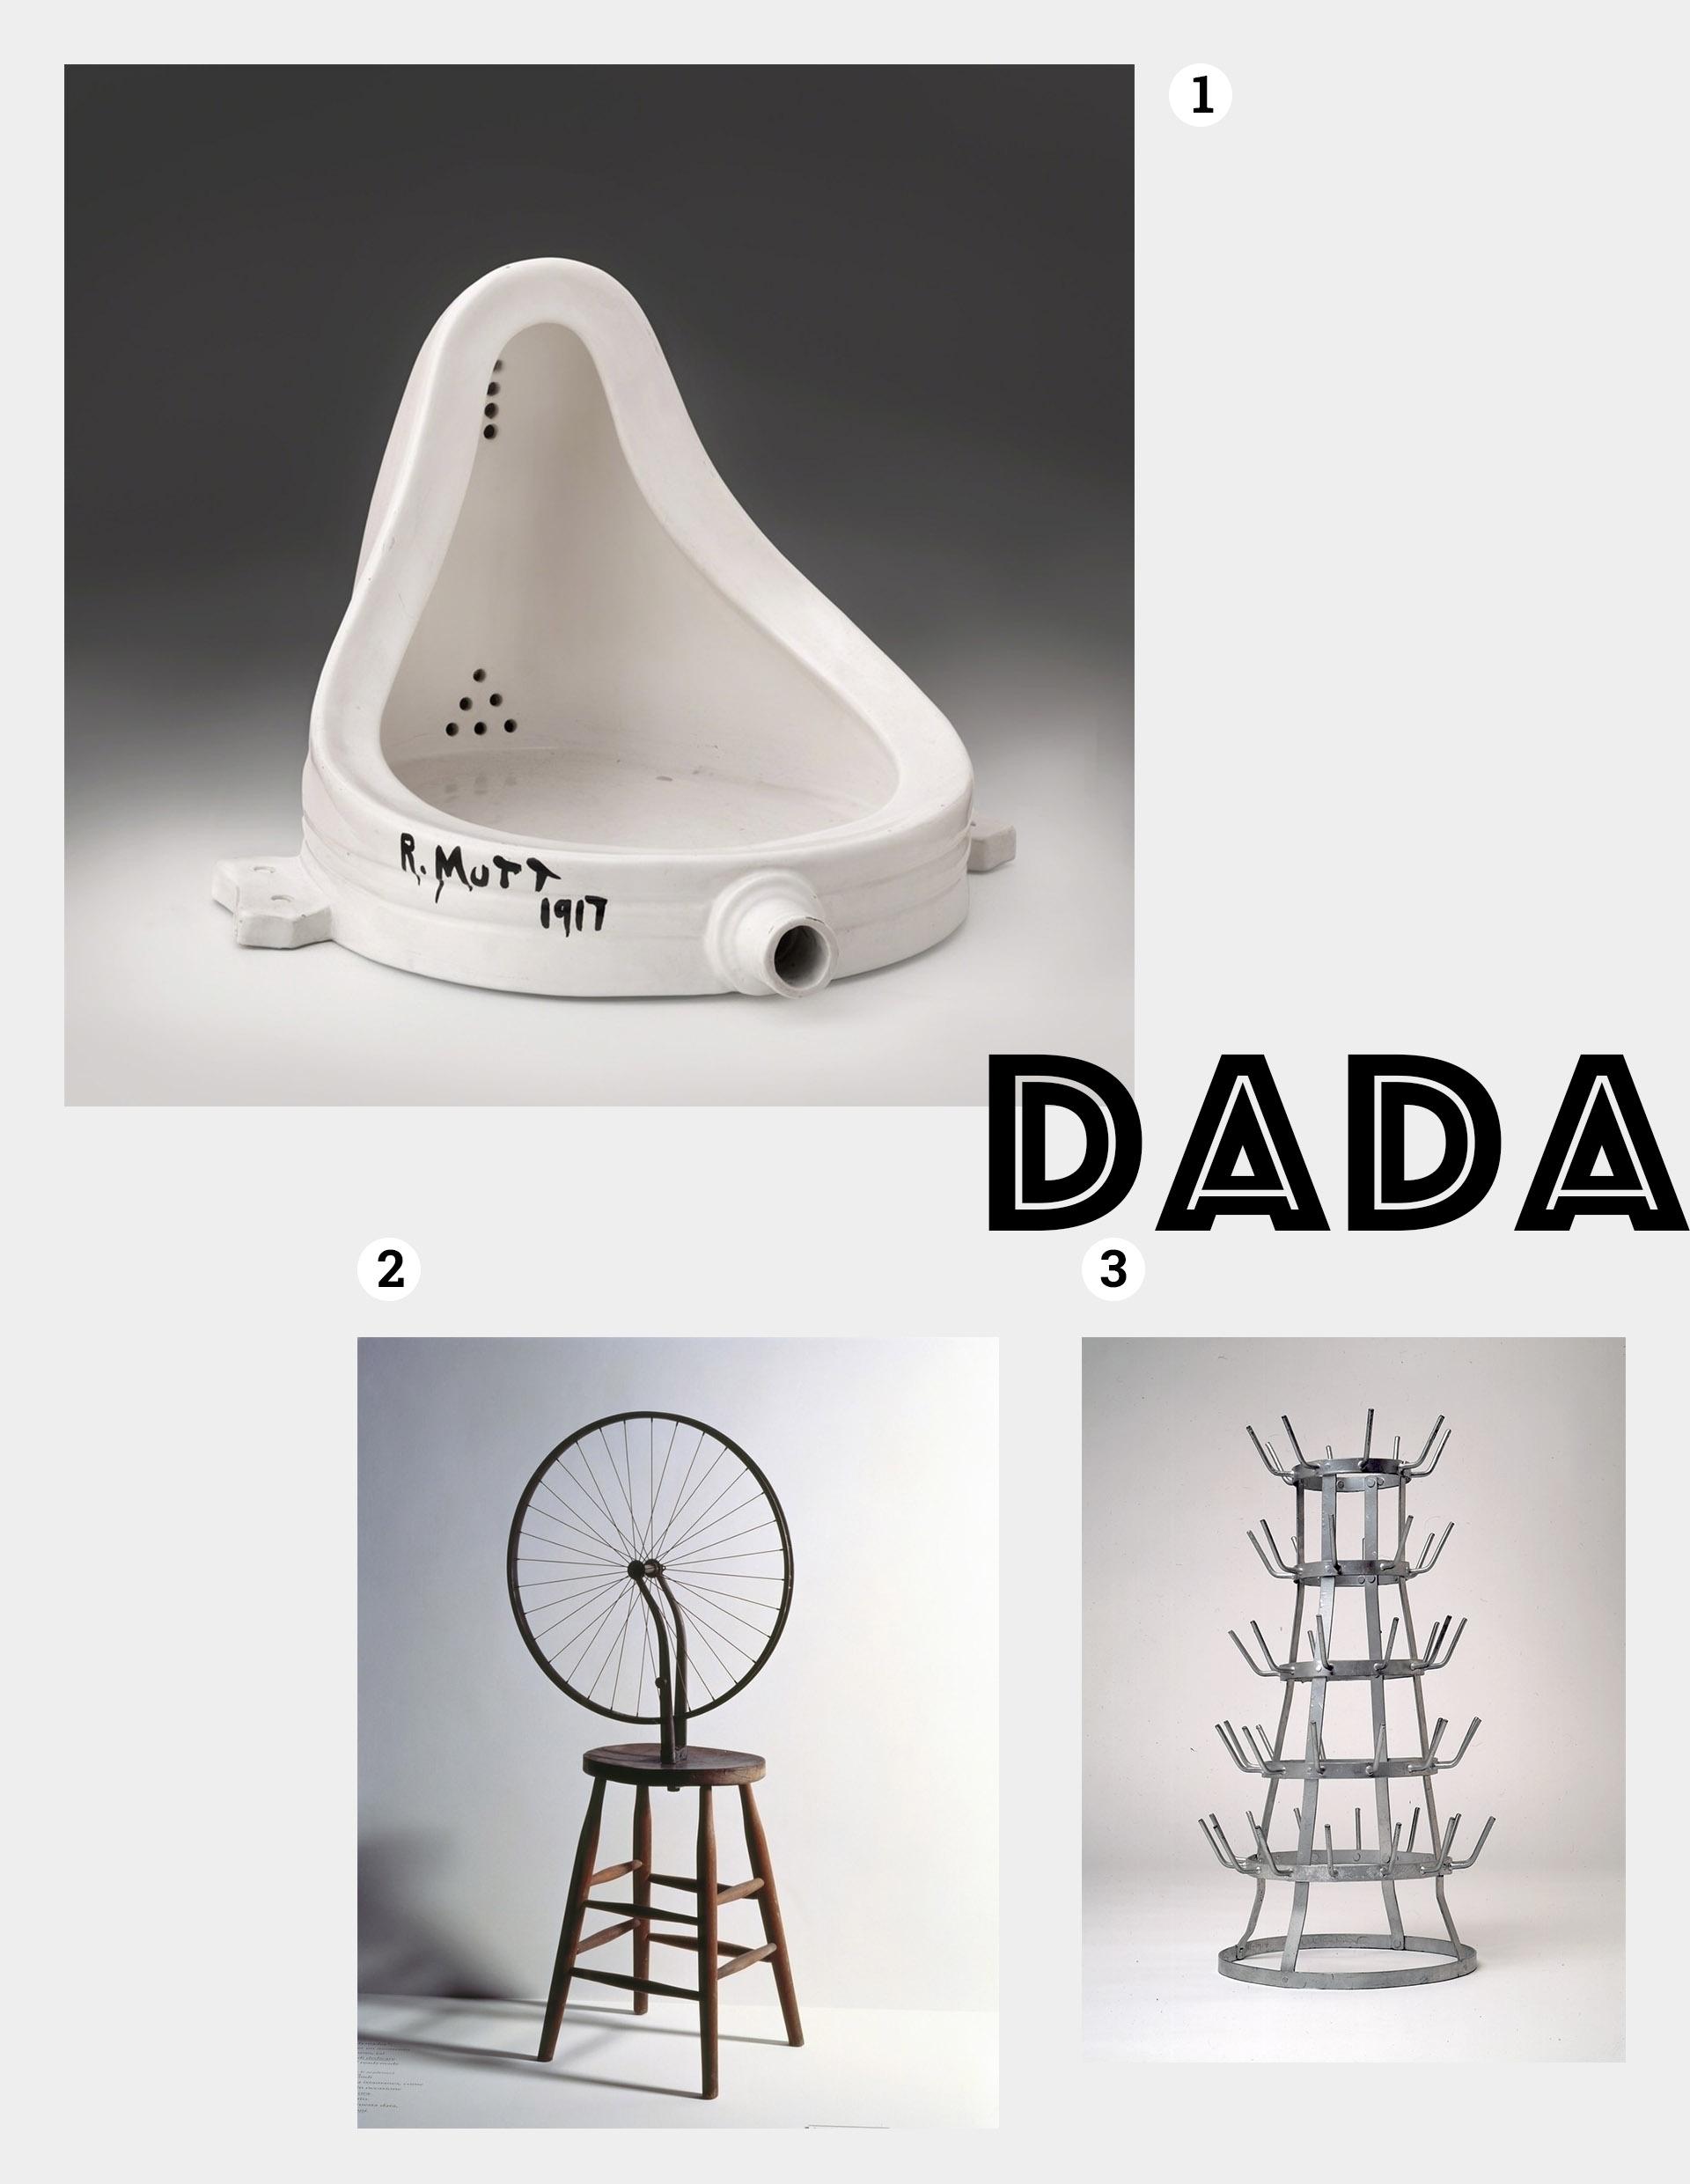 DADAizm [moodboard]